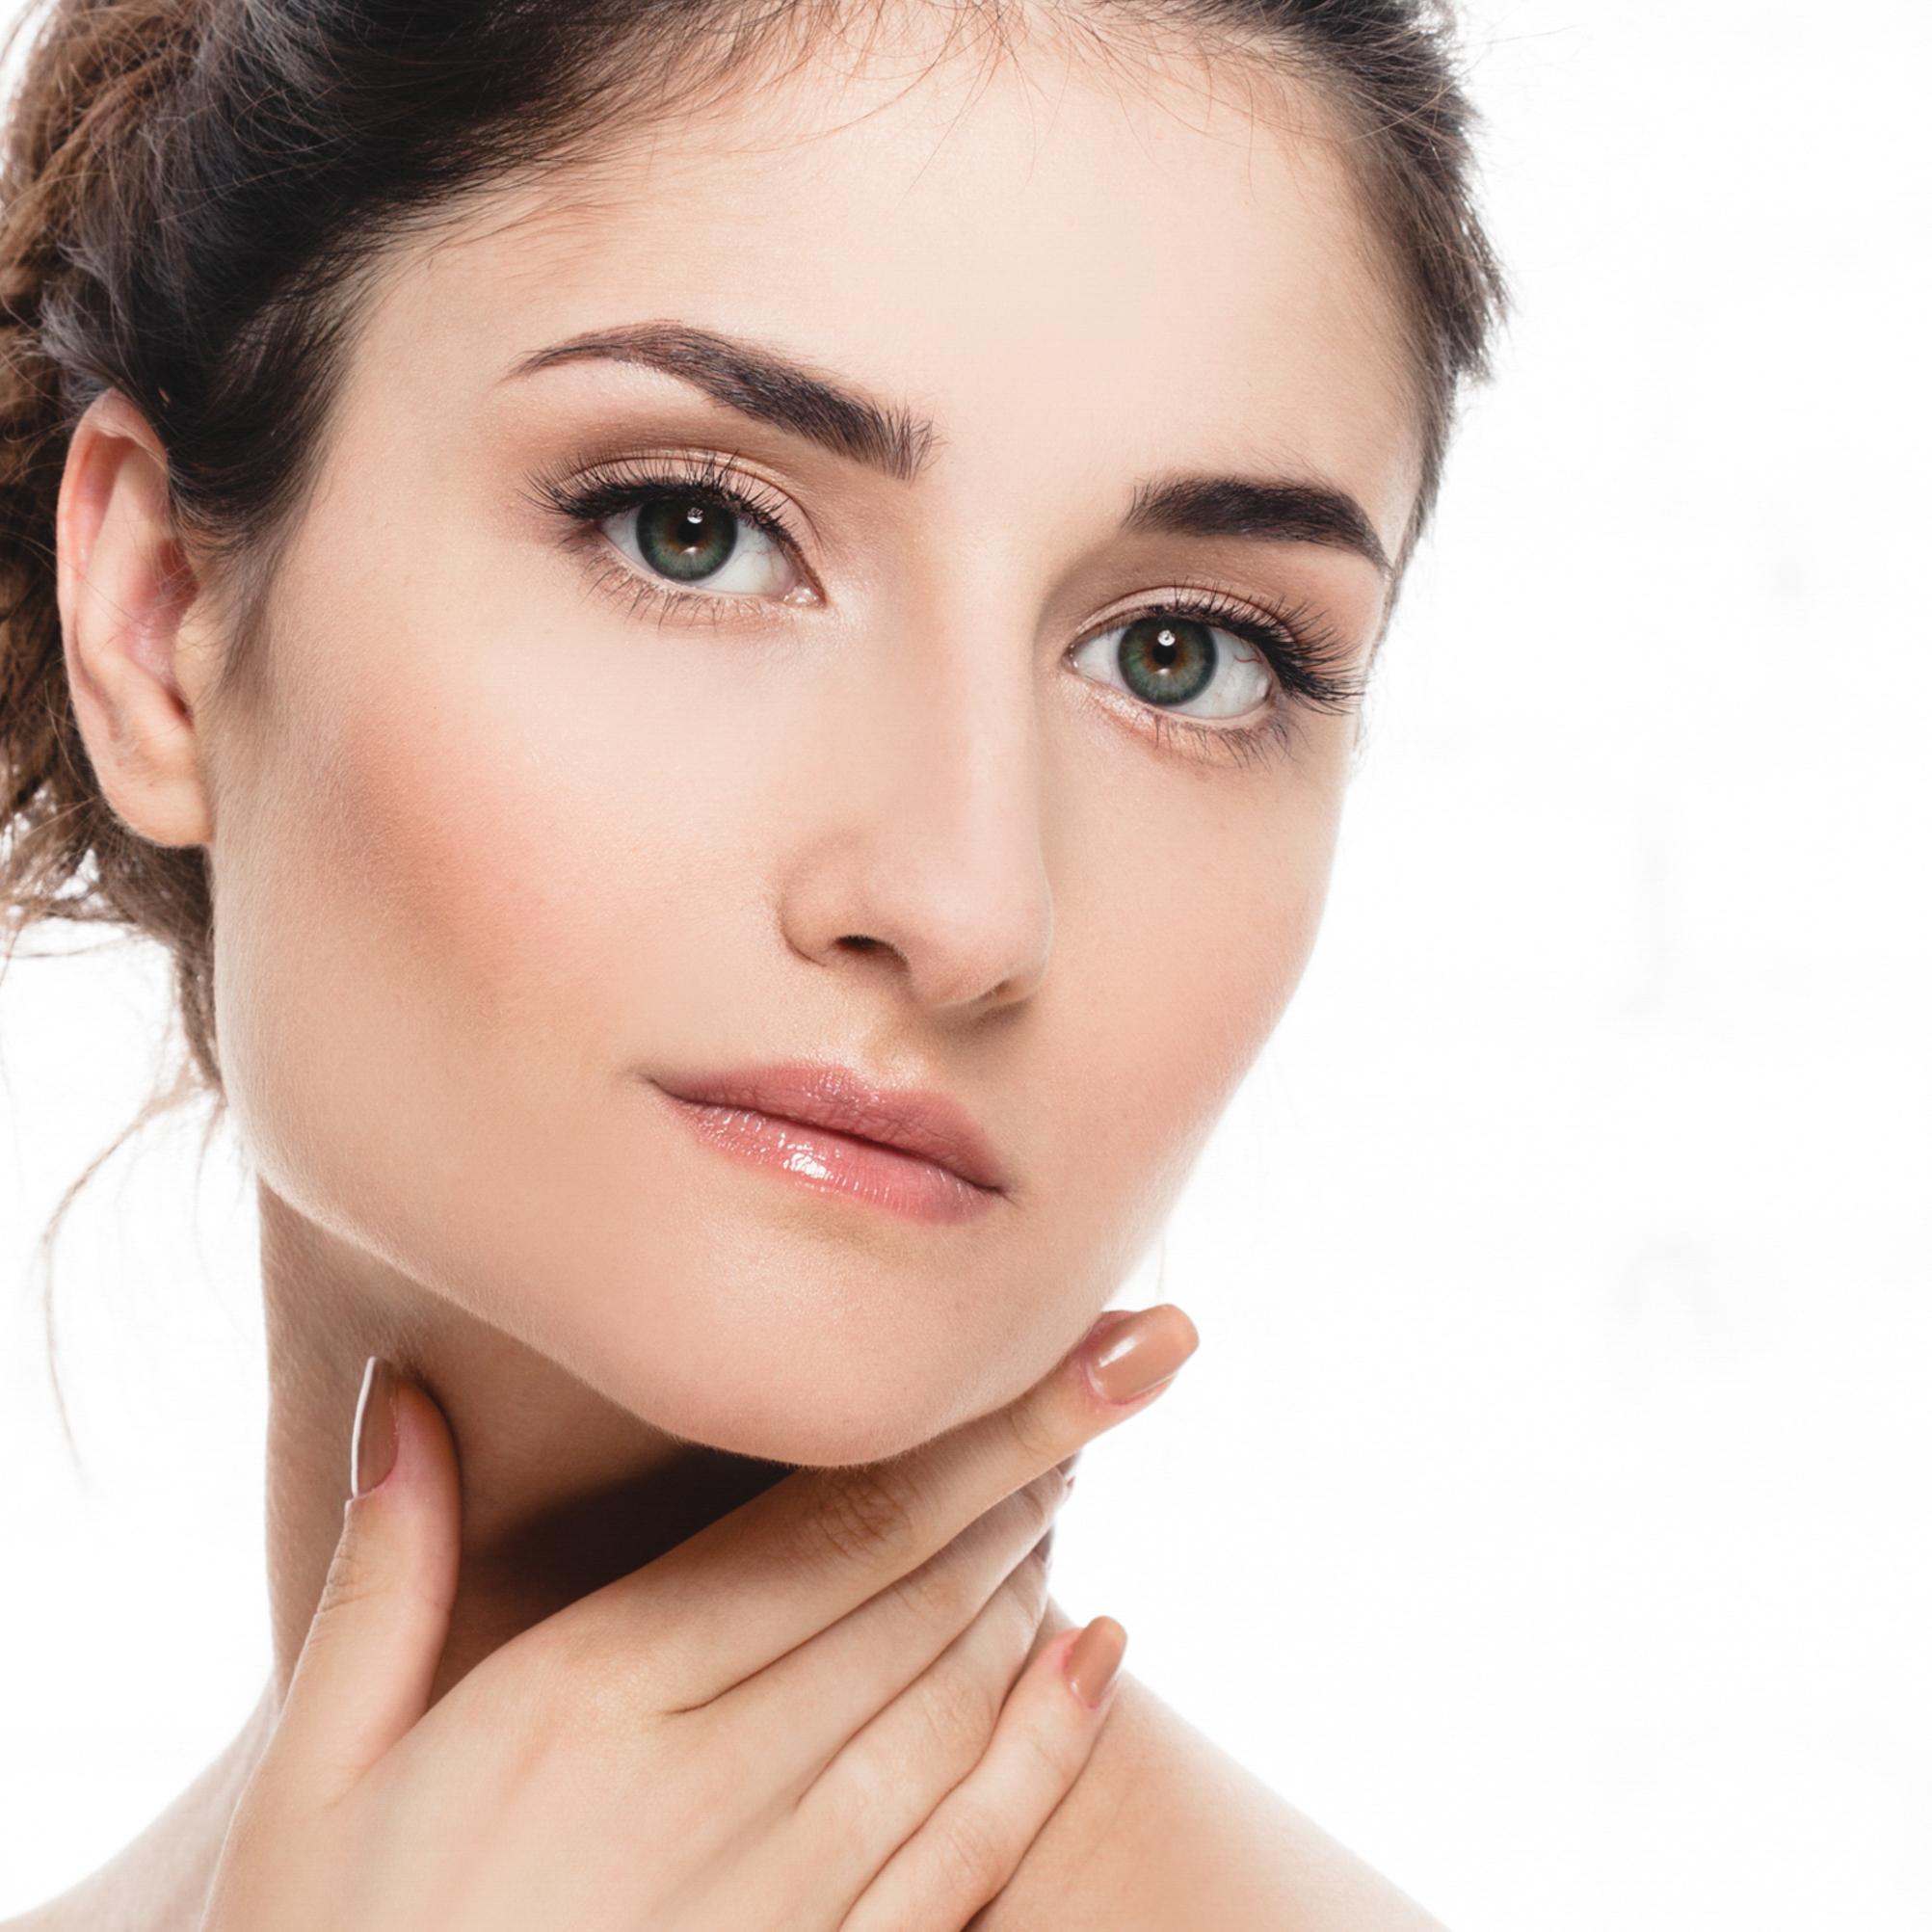 The benefits of a facial peel